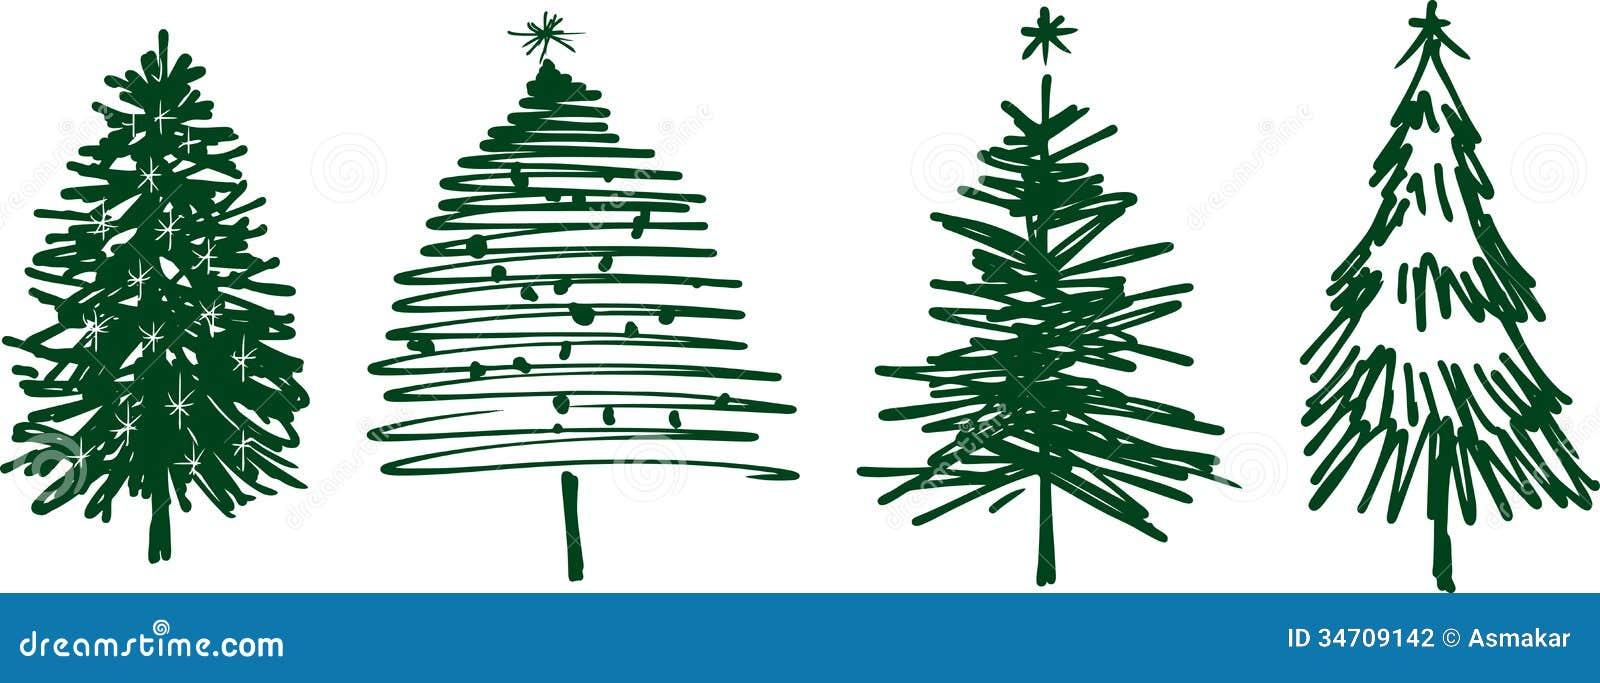 Christmas Trees Stock Photography Image 34709142